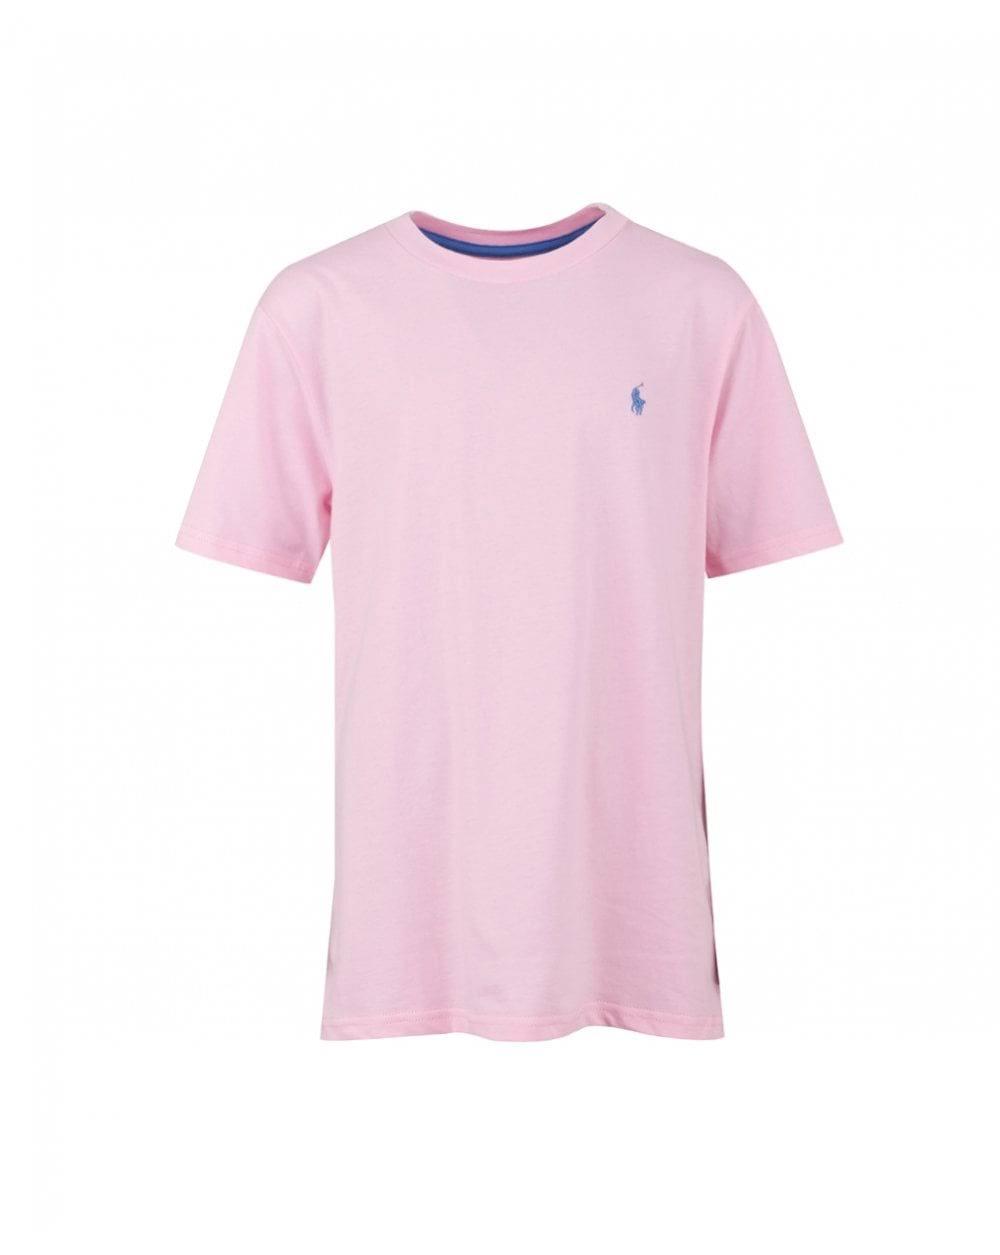 T Rose Ralph rosa Lauren shirt QeEWrdCxoB